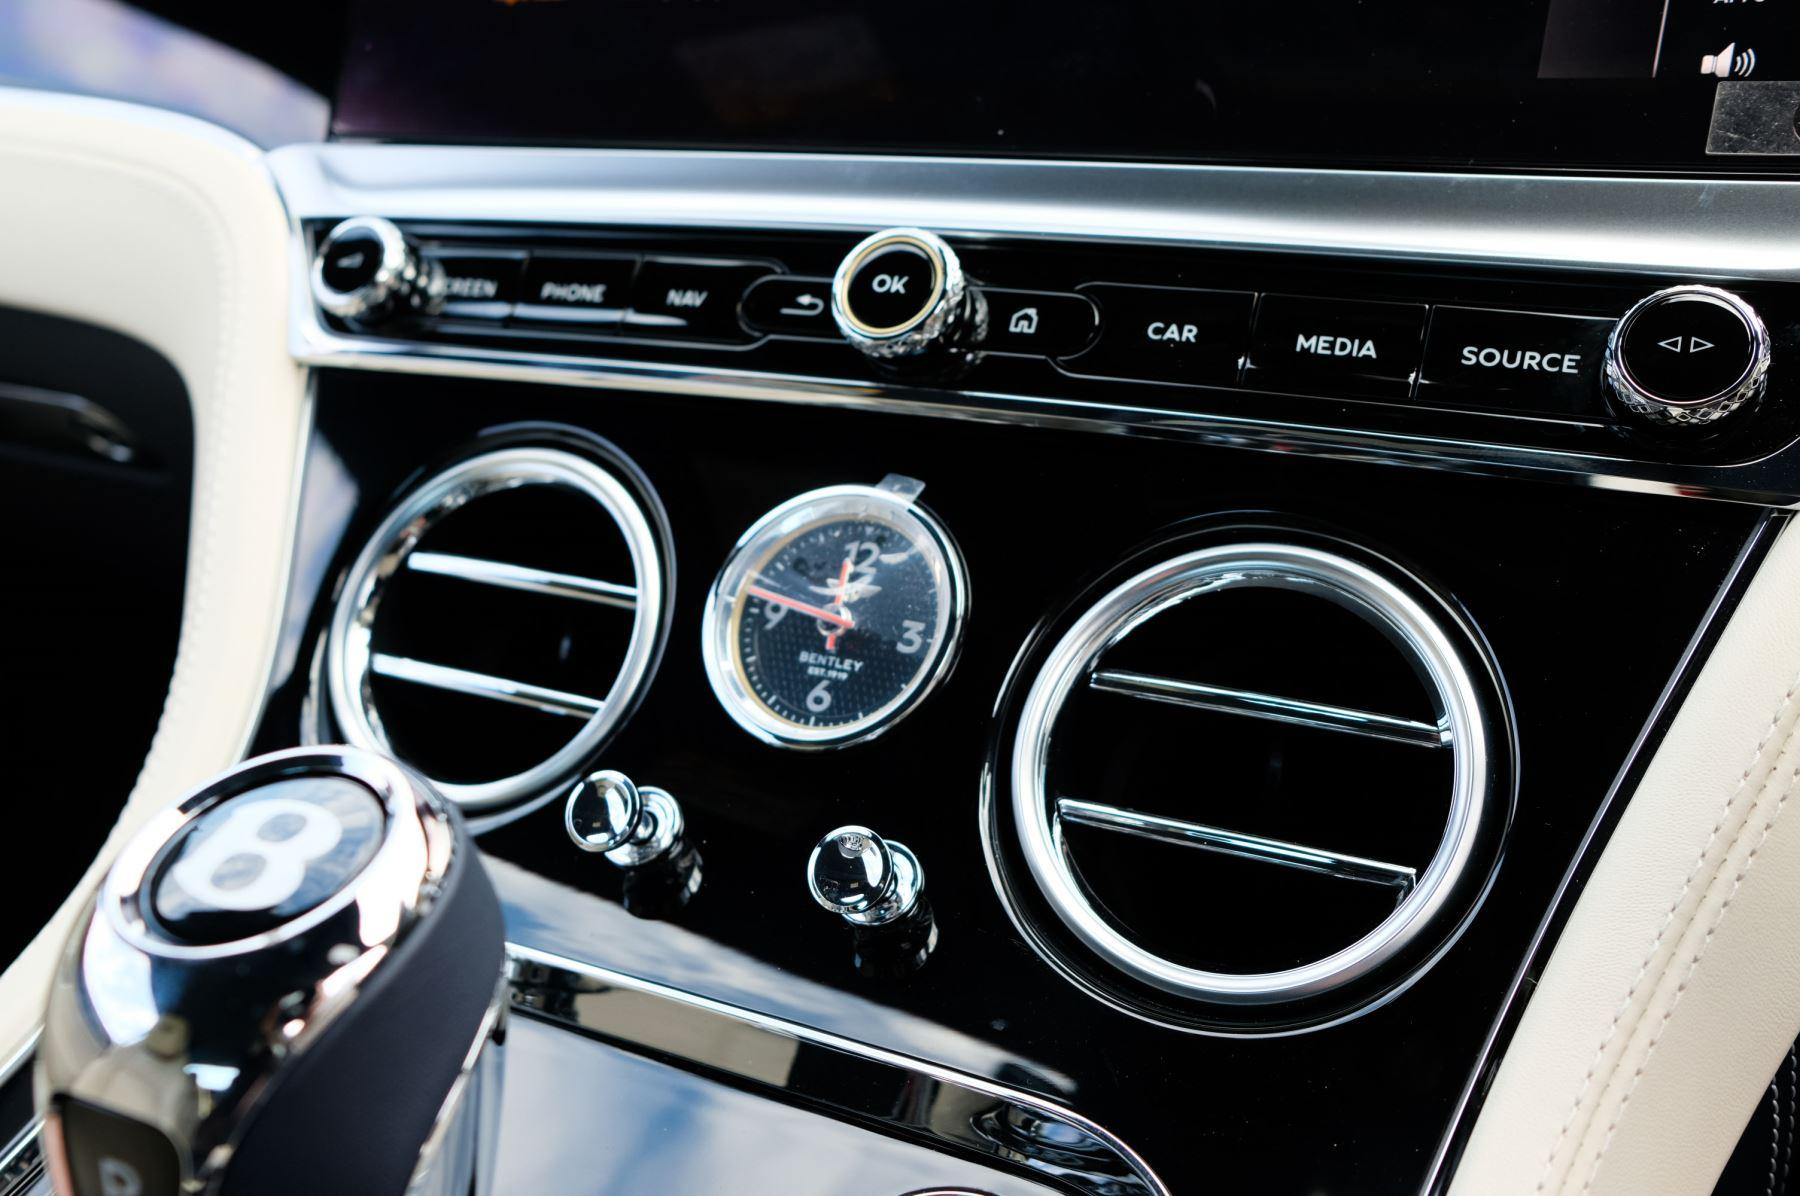 Bentley Continental GTC 4.0 V8 Mulliner Edition 2dr Auto [Tour Spec] image 19